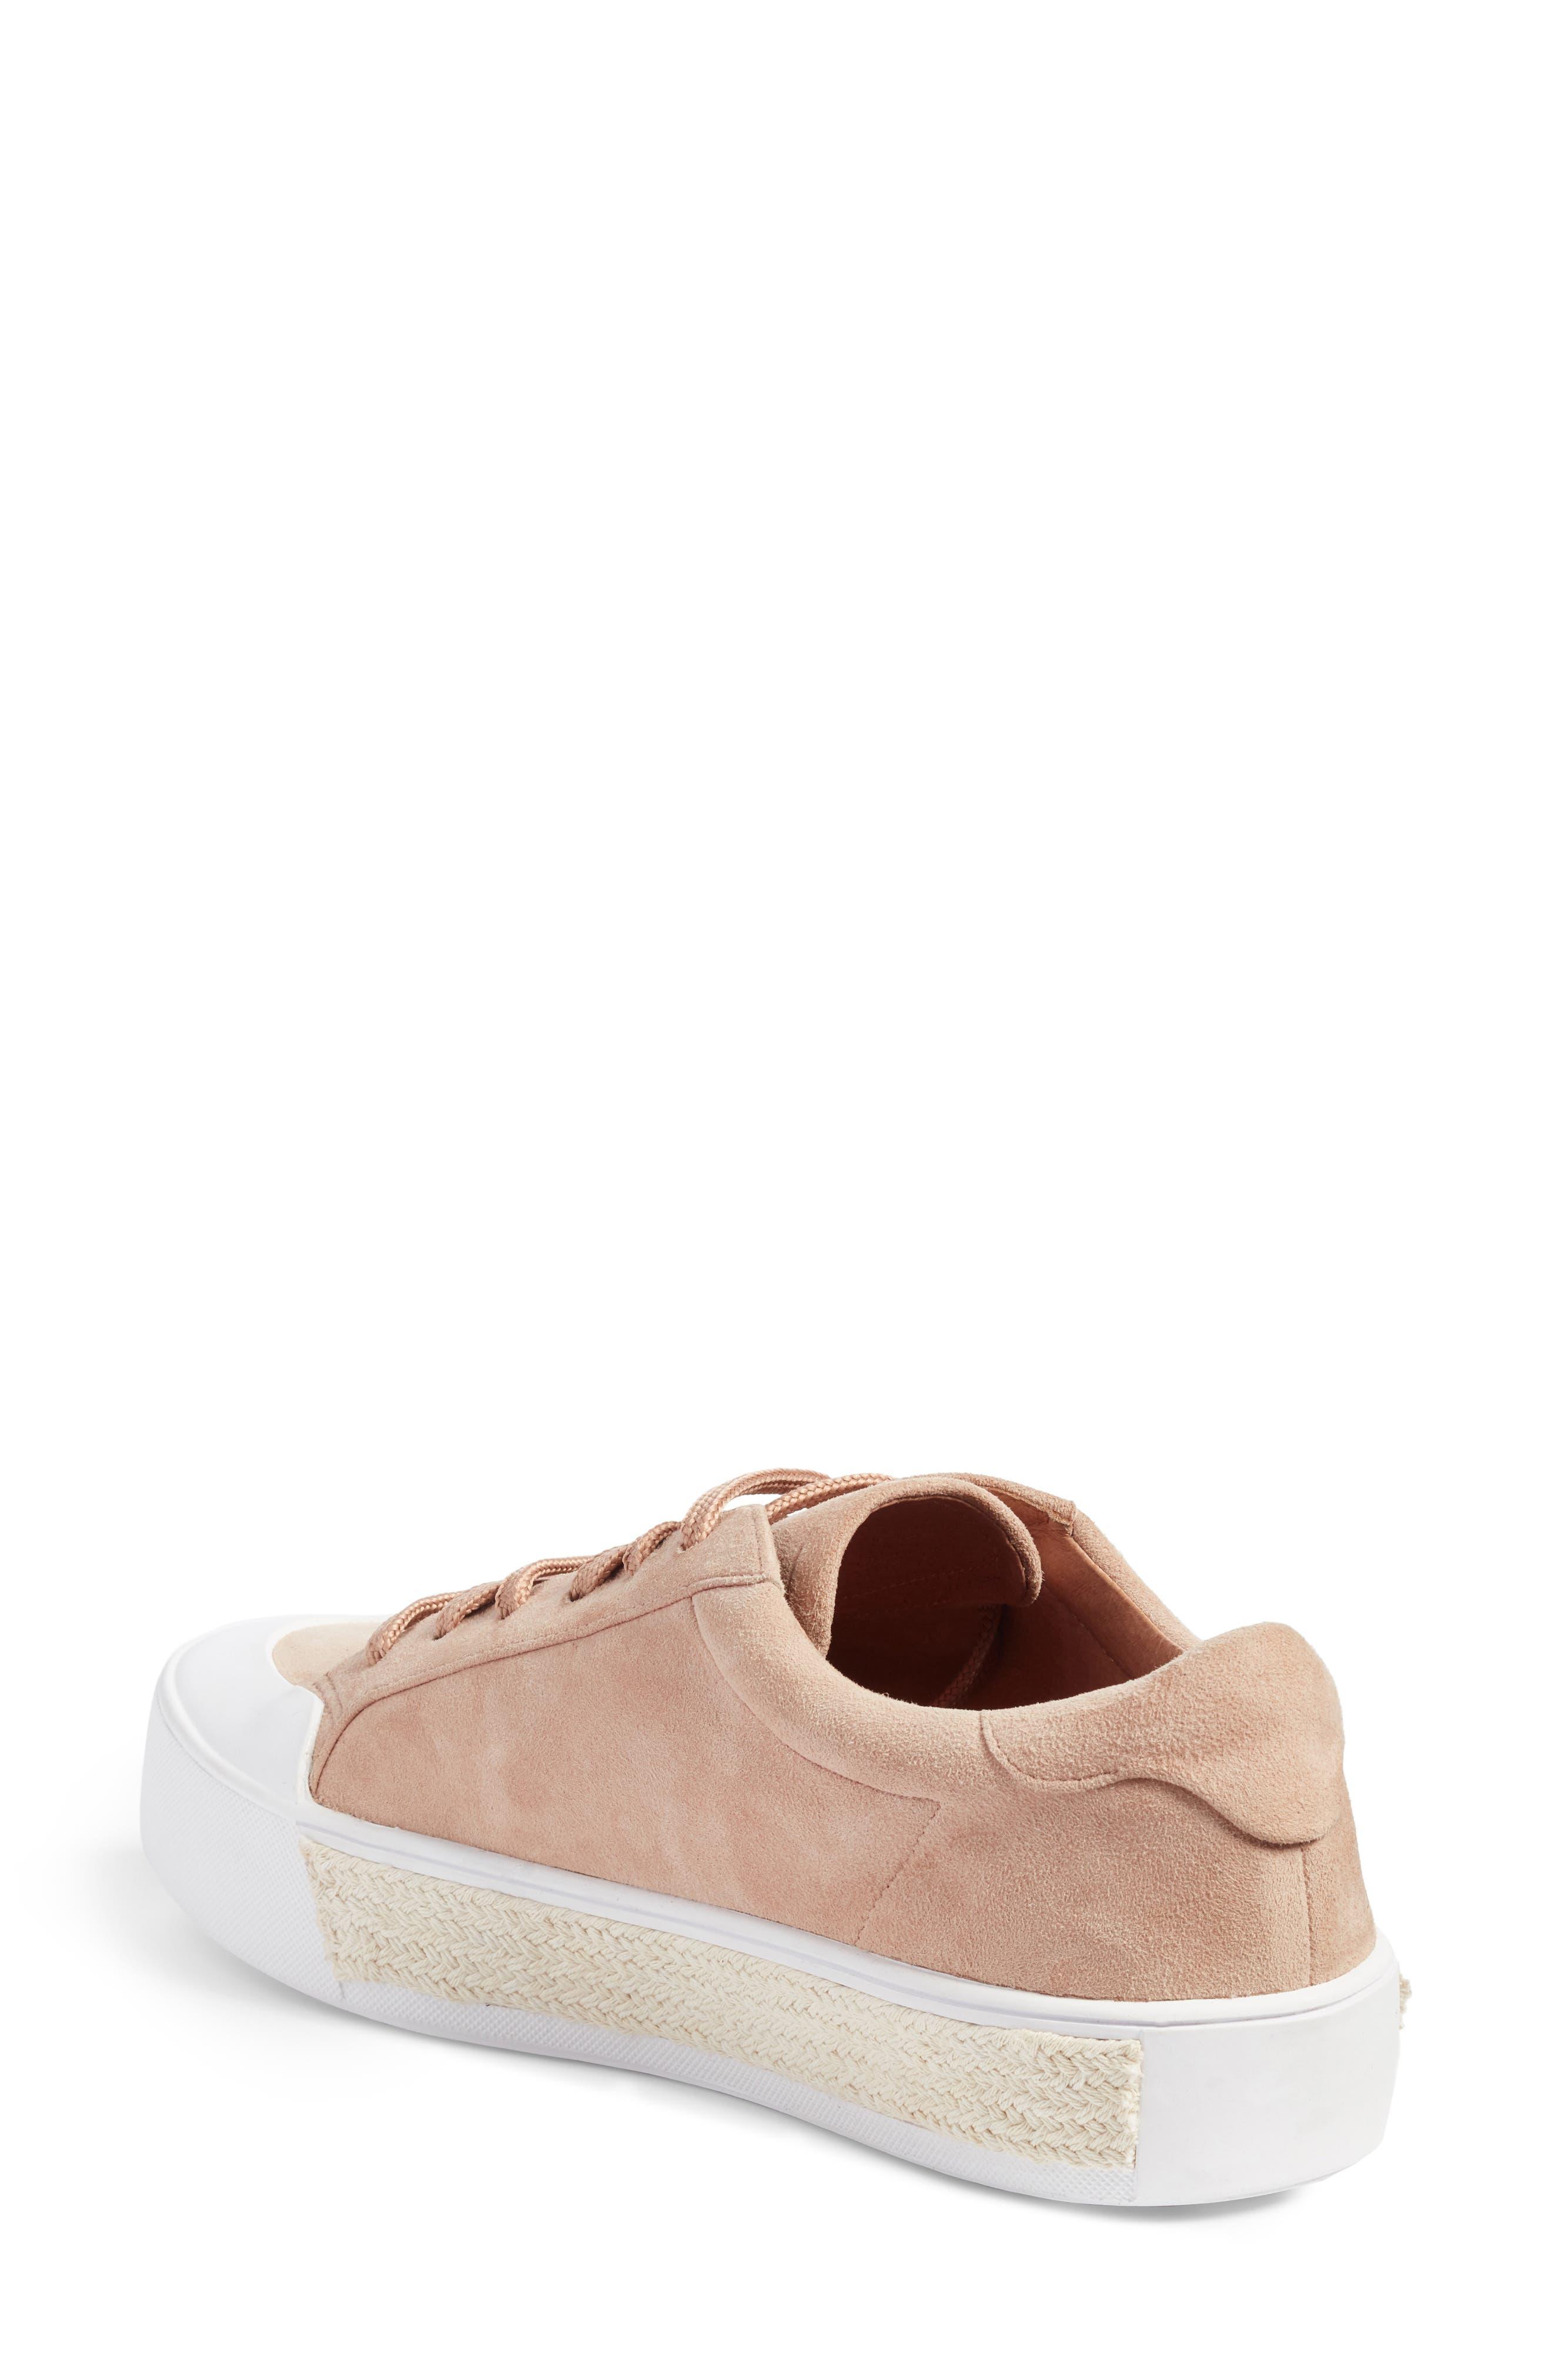 Toran Platform Sneaker,                             Alternate thumbnail 2, color,                             Blush Suede